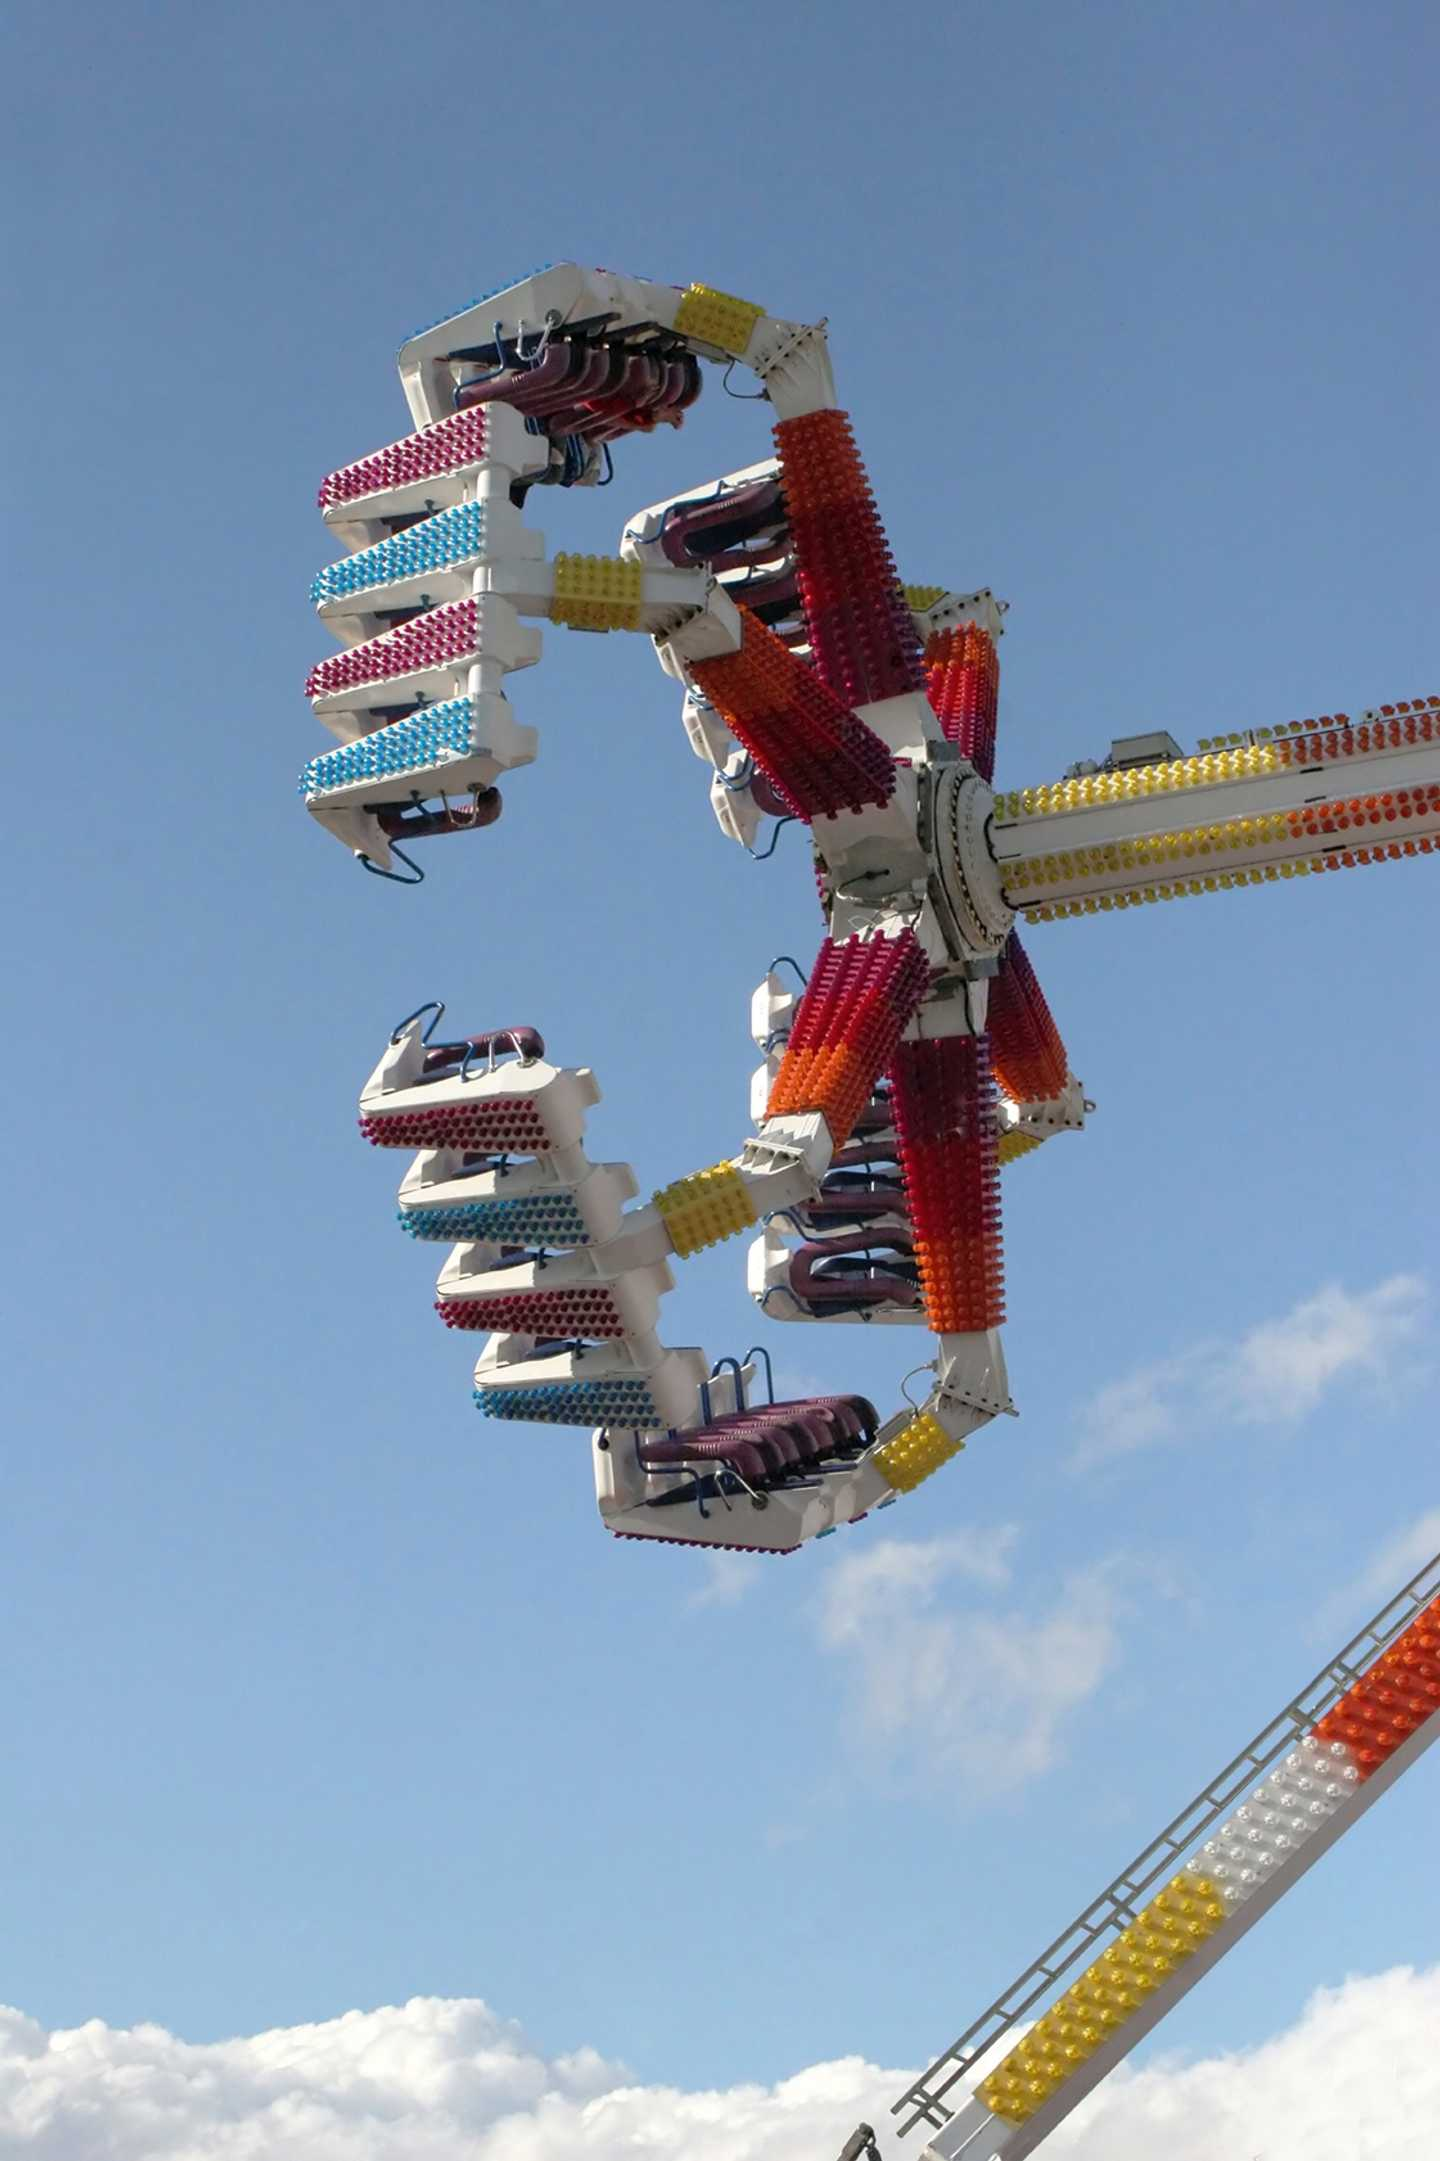 The Fireball pendulum ride